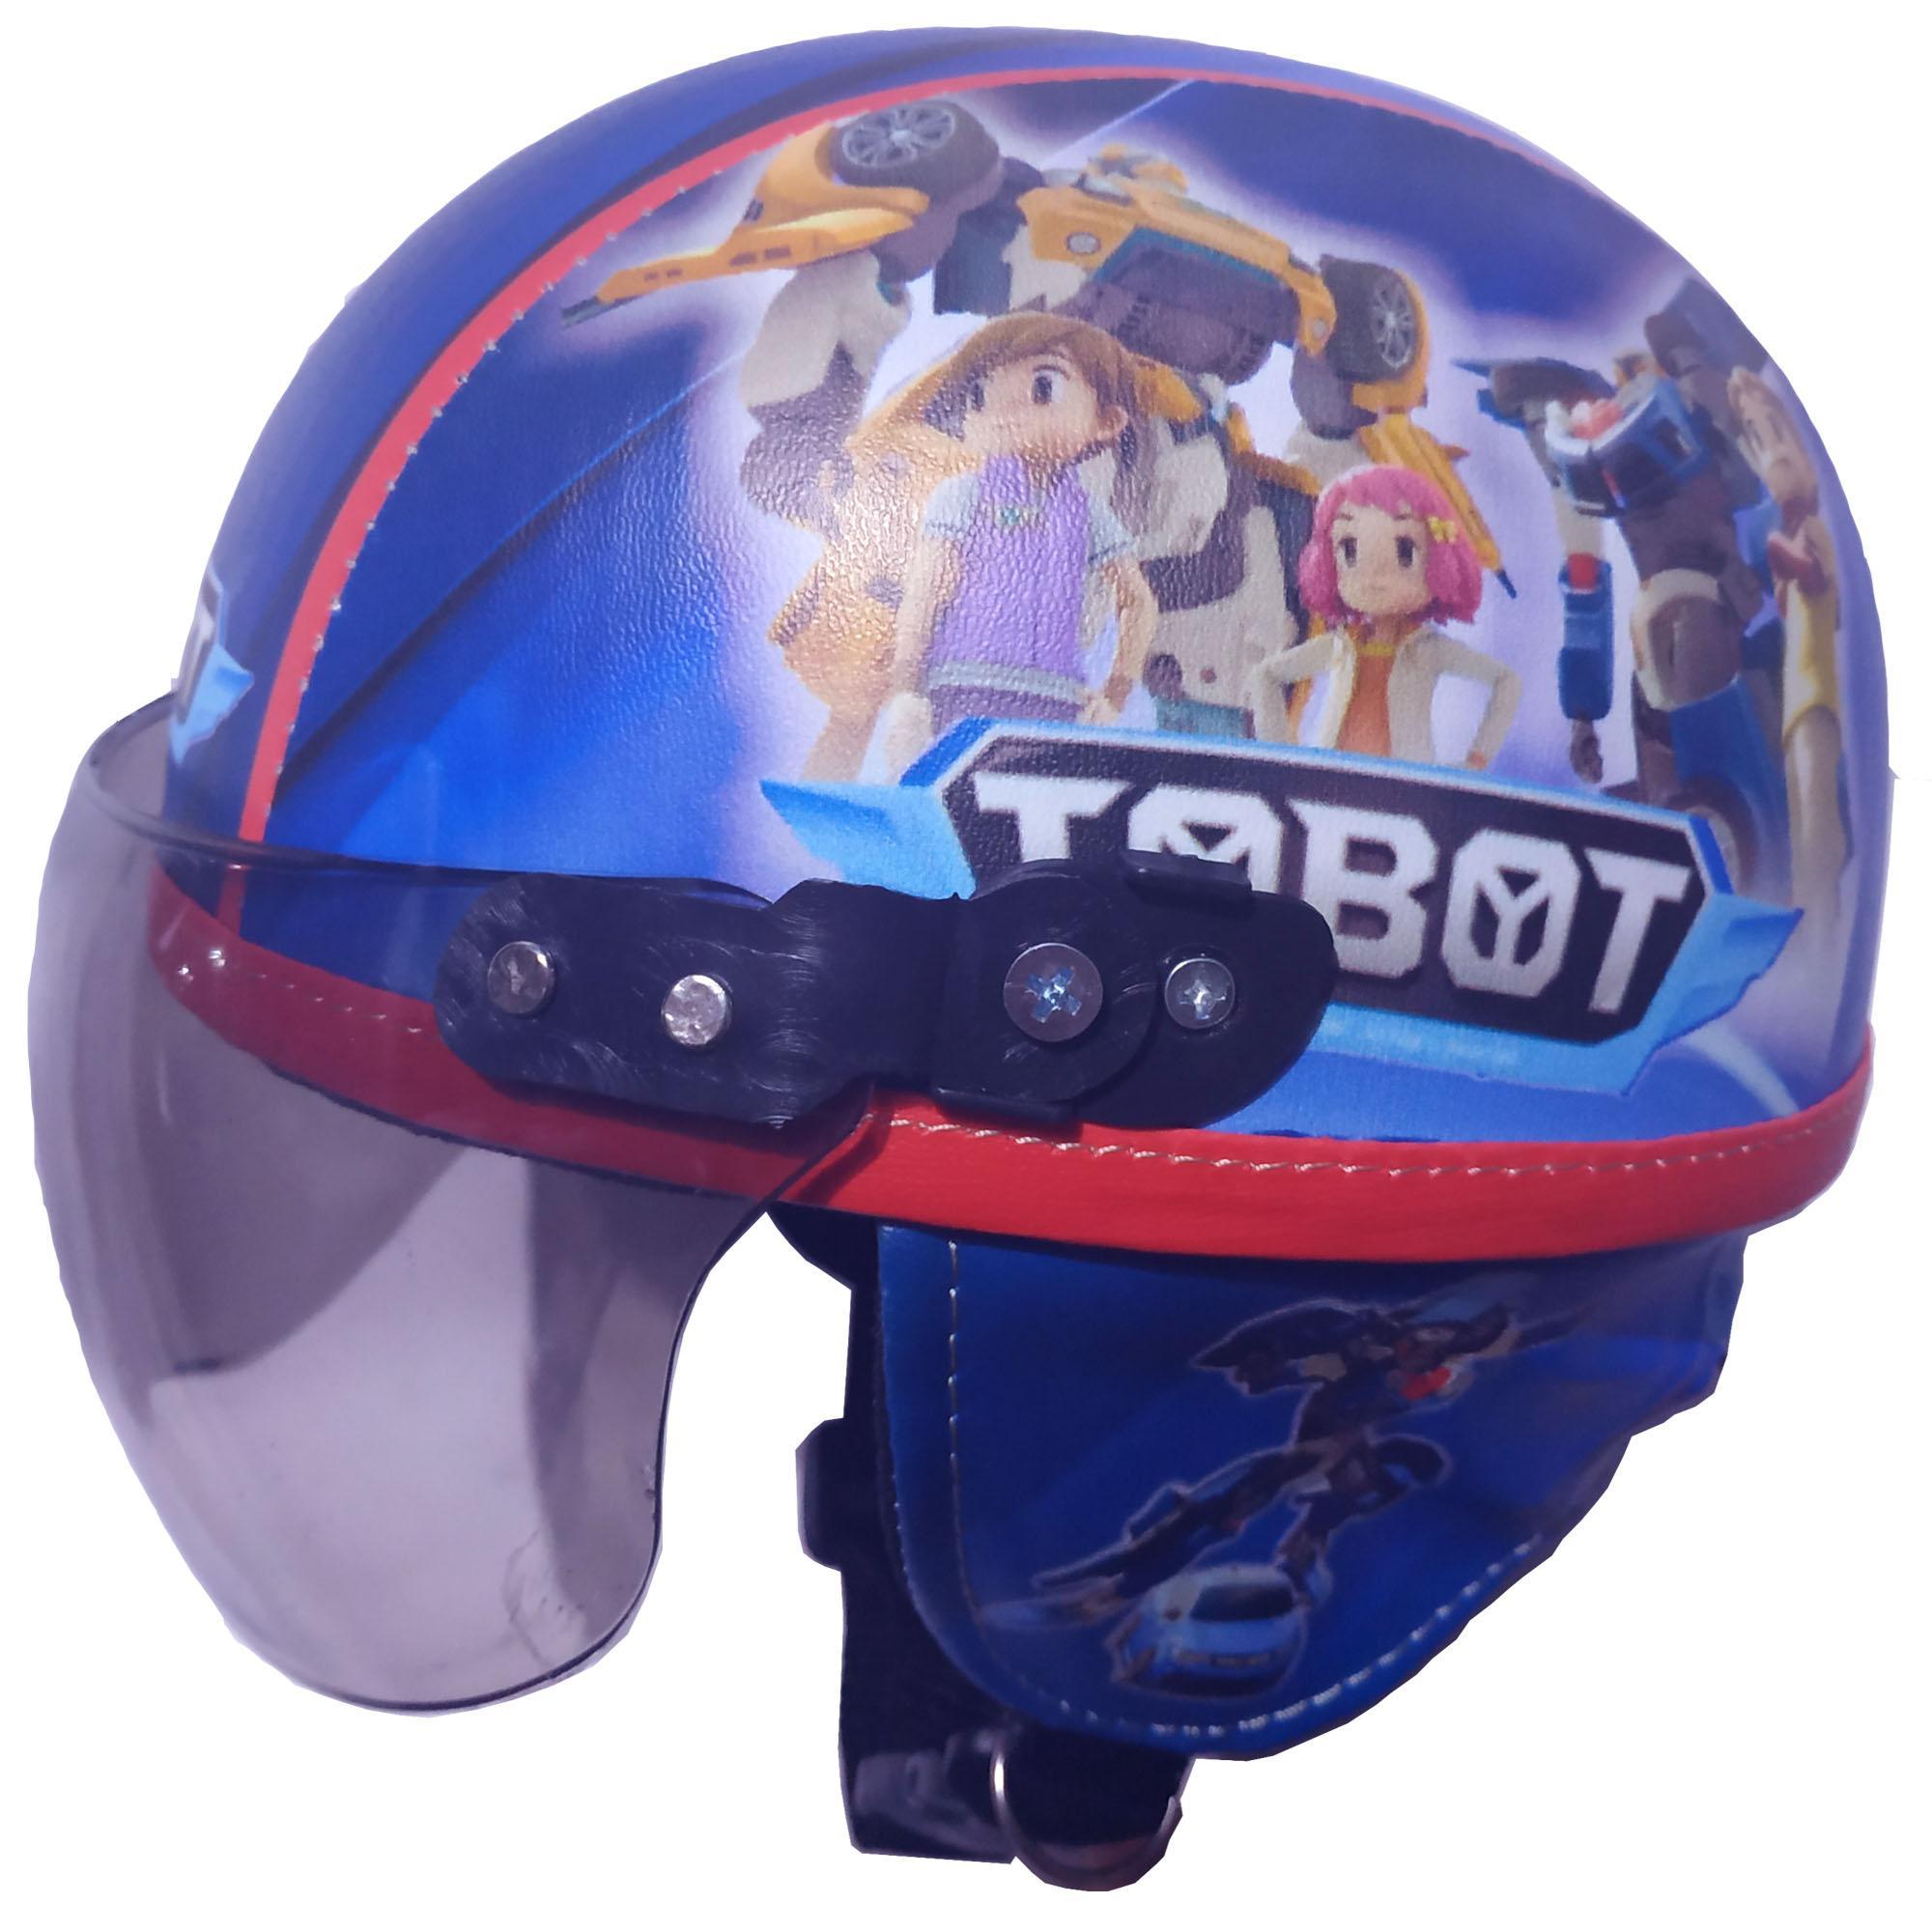 Helm Anak Anak Broco Retro Kaca Riben Lucu Usia 1 Sampai 4 Tahun Motif Tobot Biru Printing By Toserba Shop.